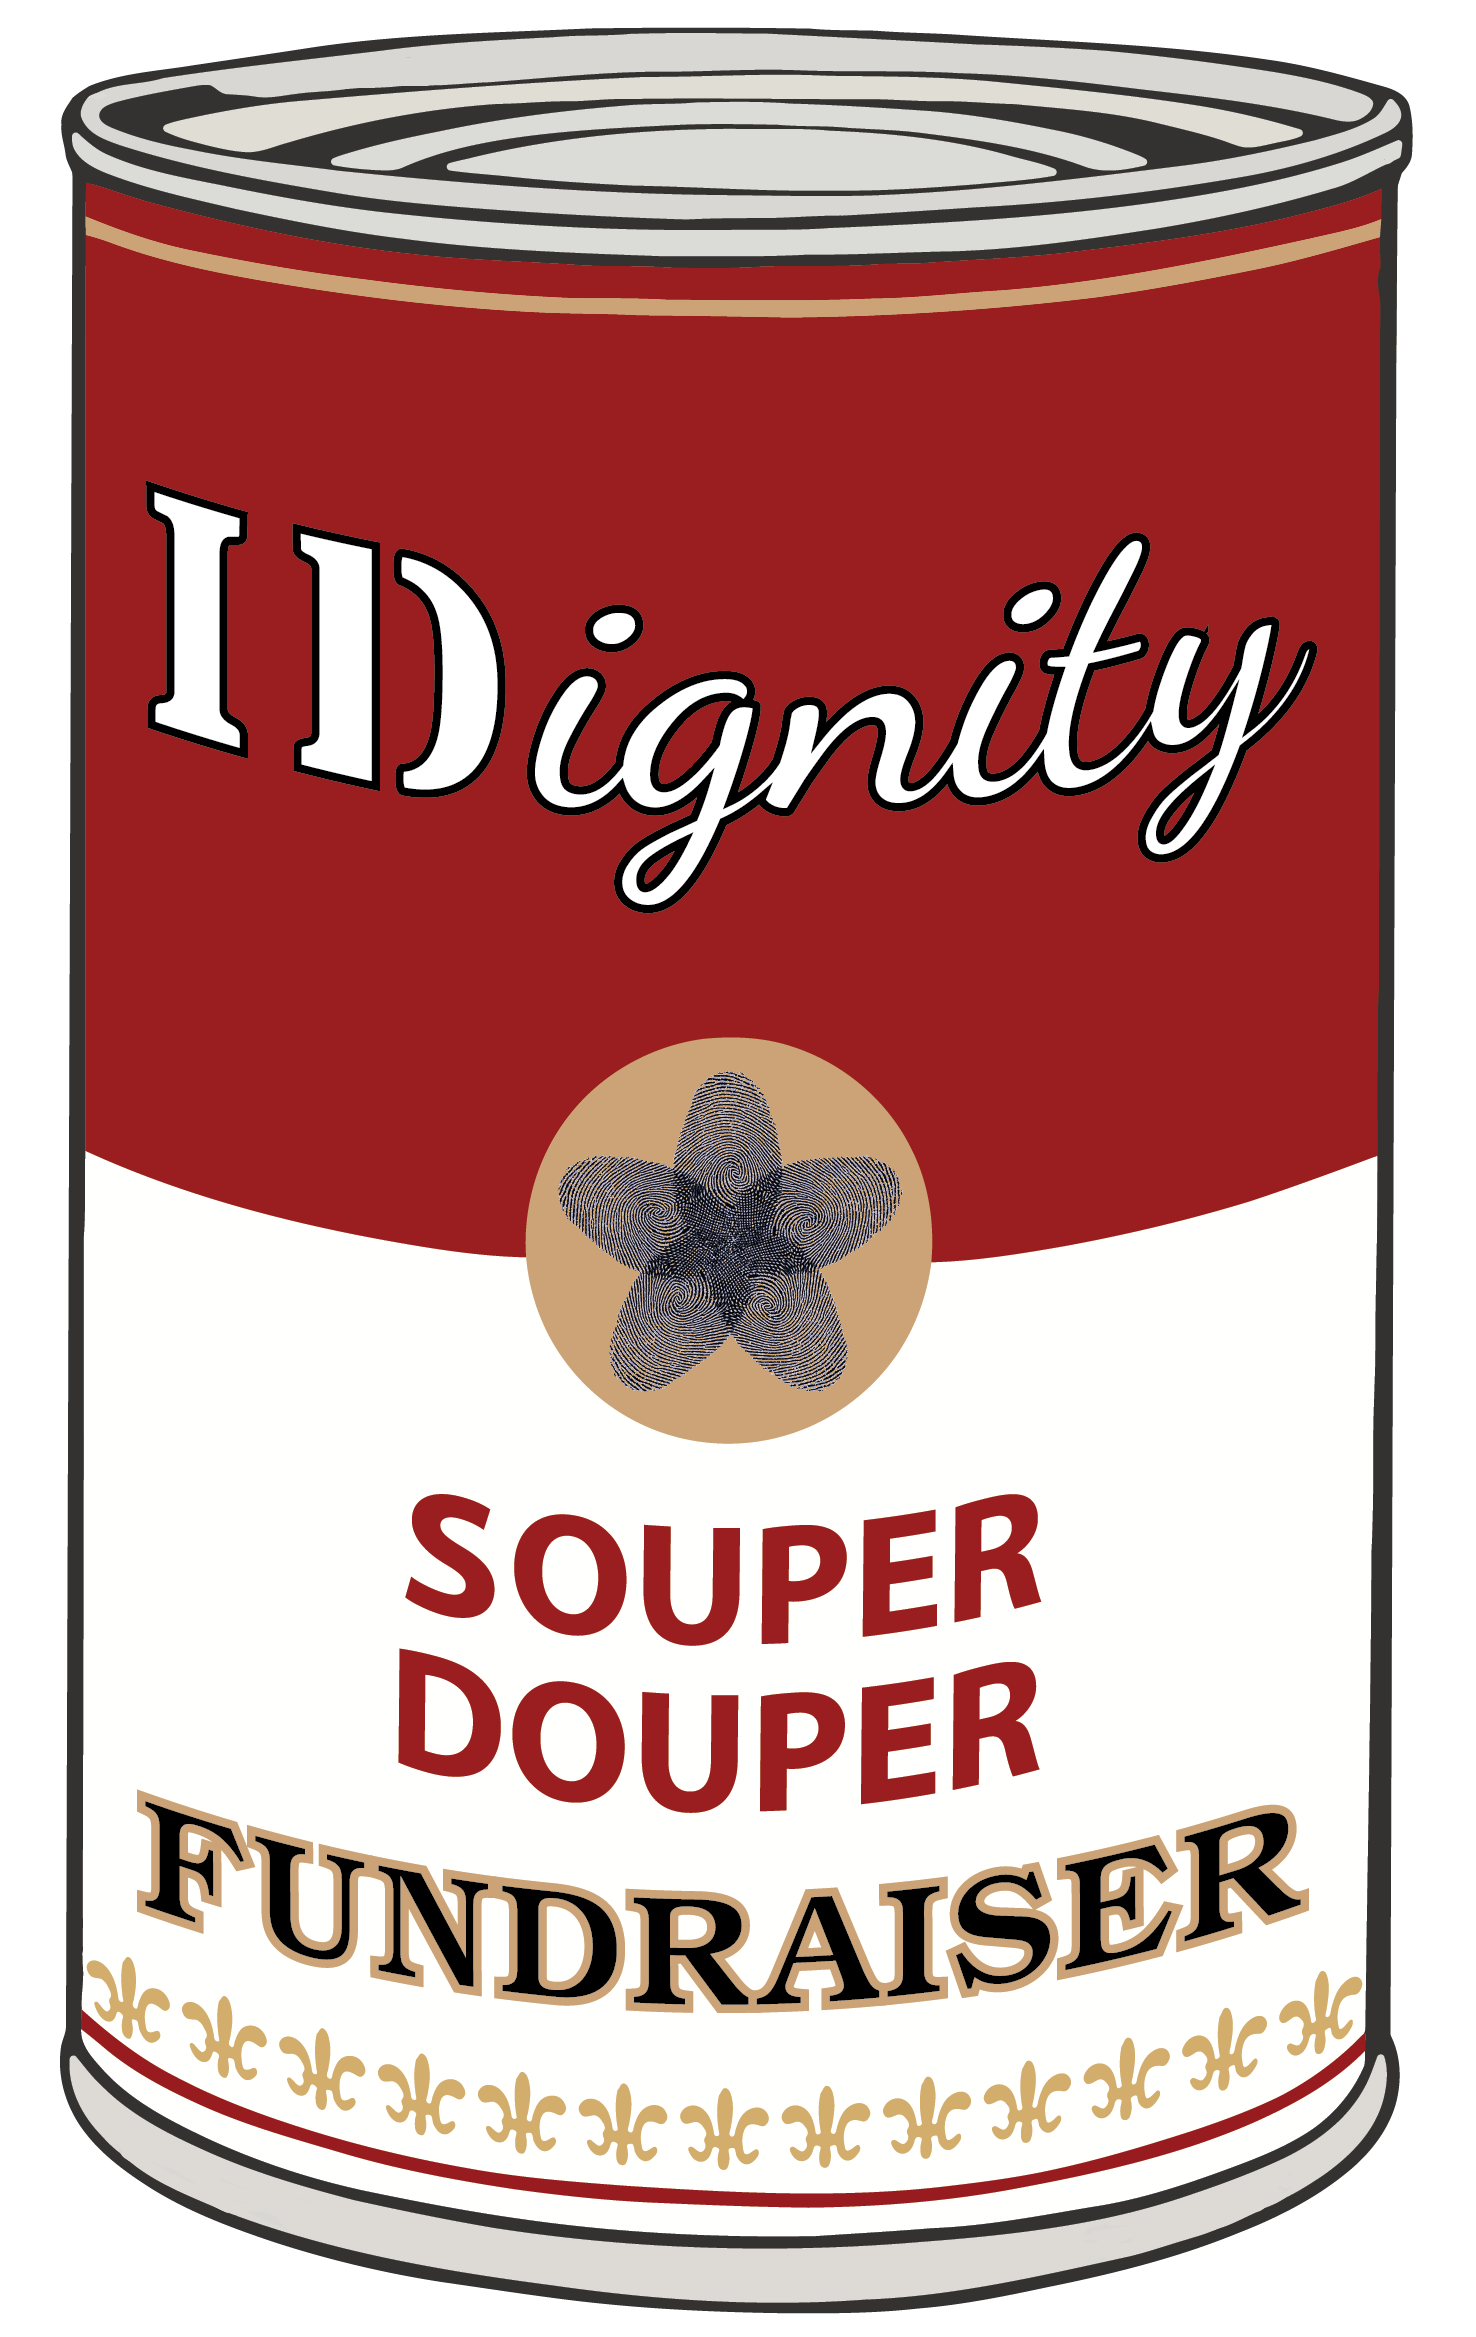 IDignity Souper Douper Can Logo